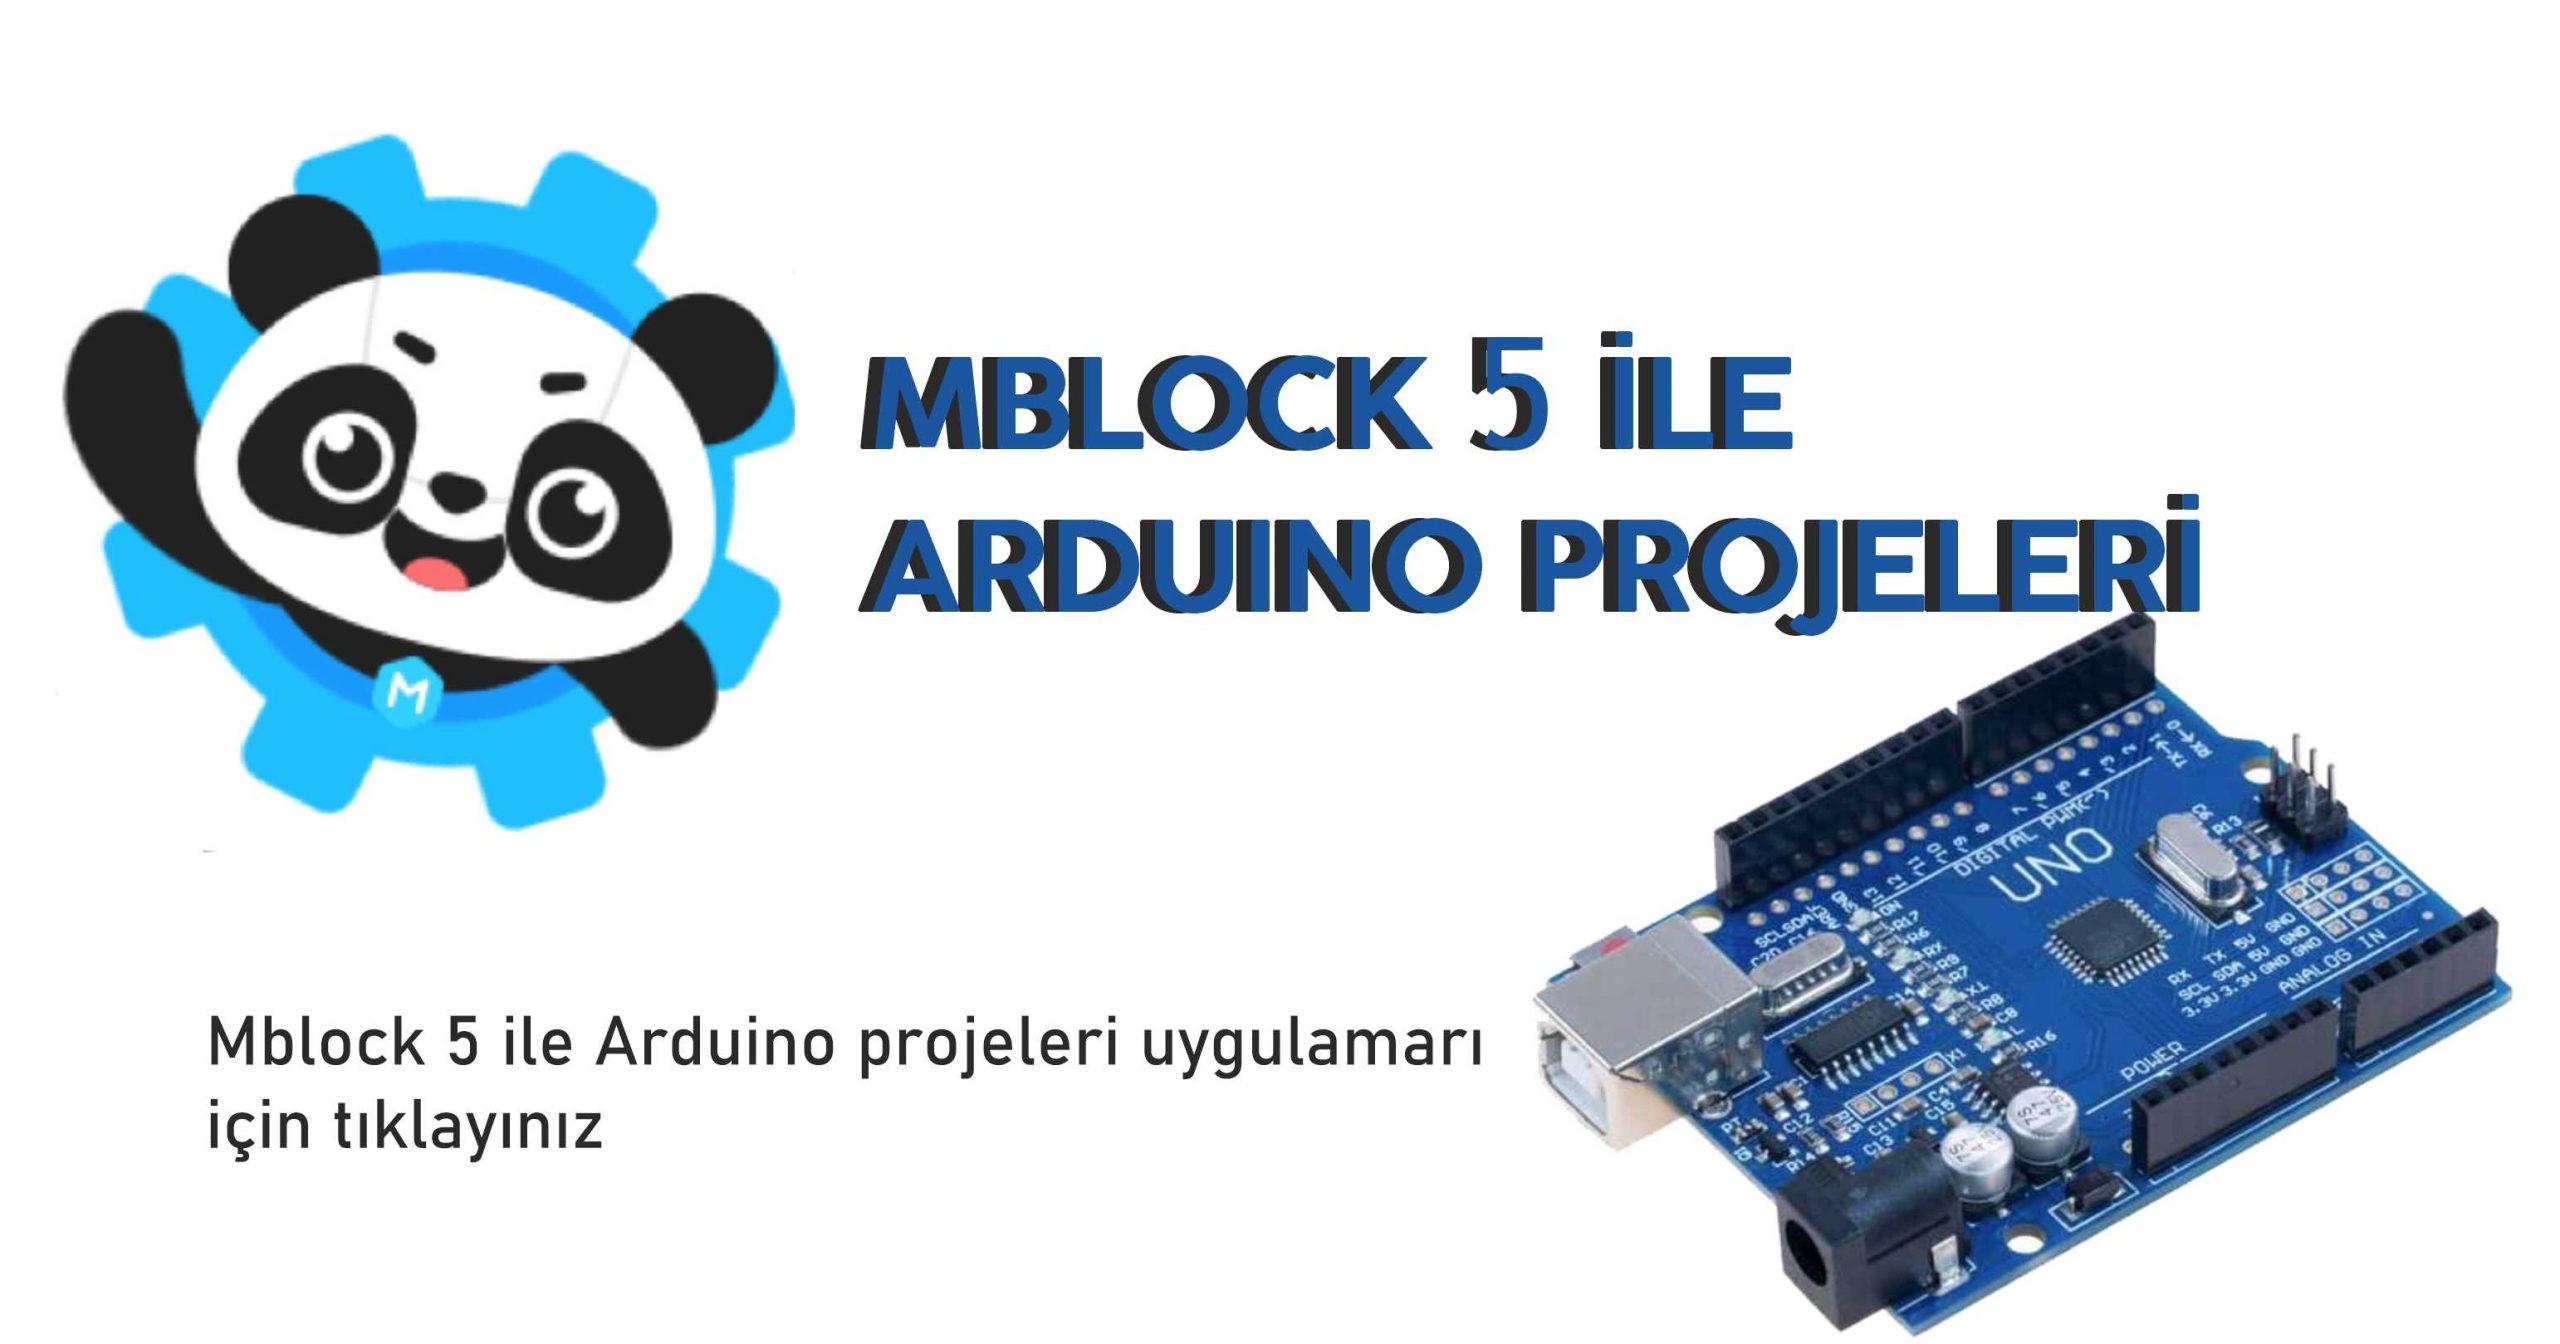 Mblock 5 ile arduino